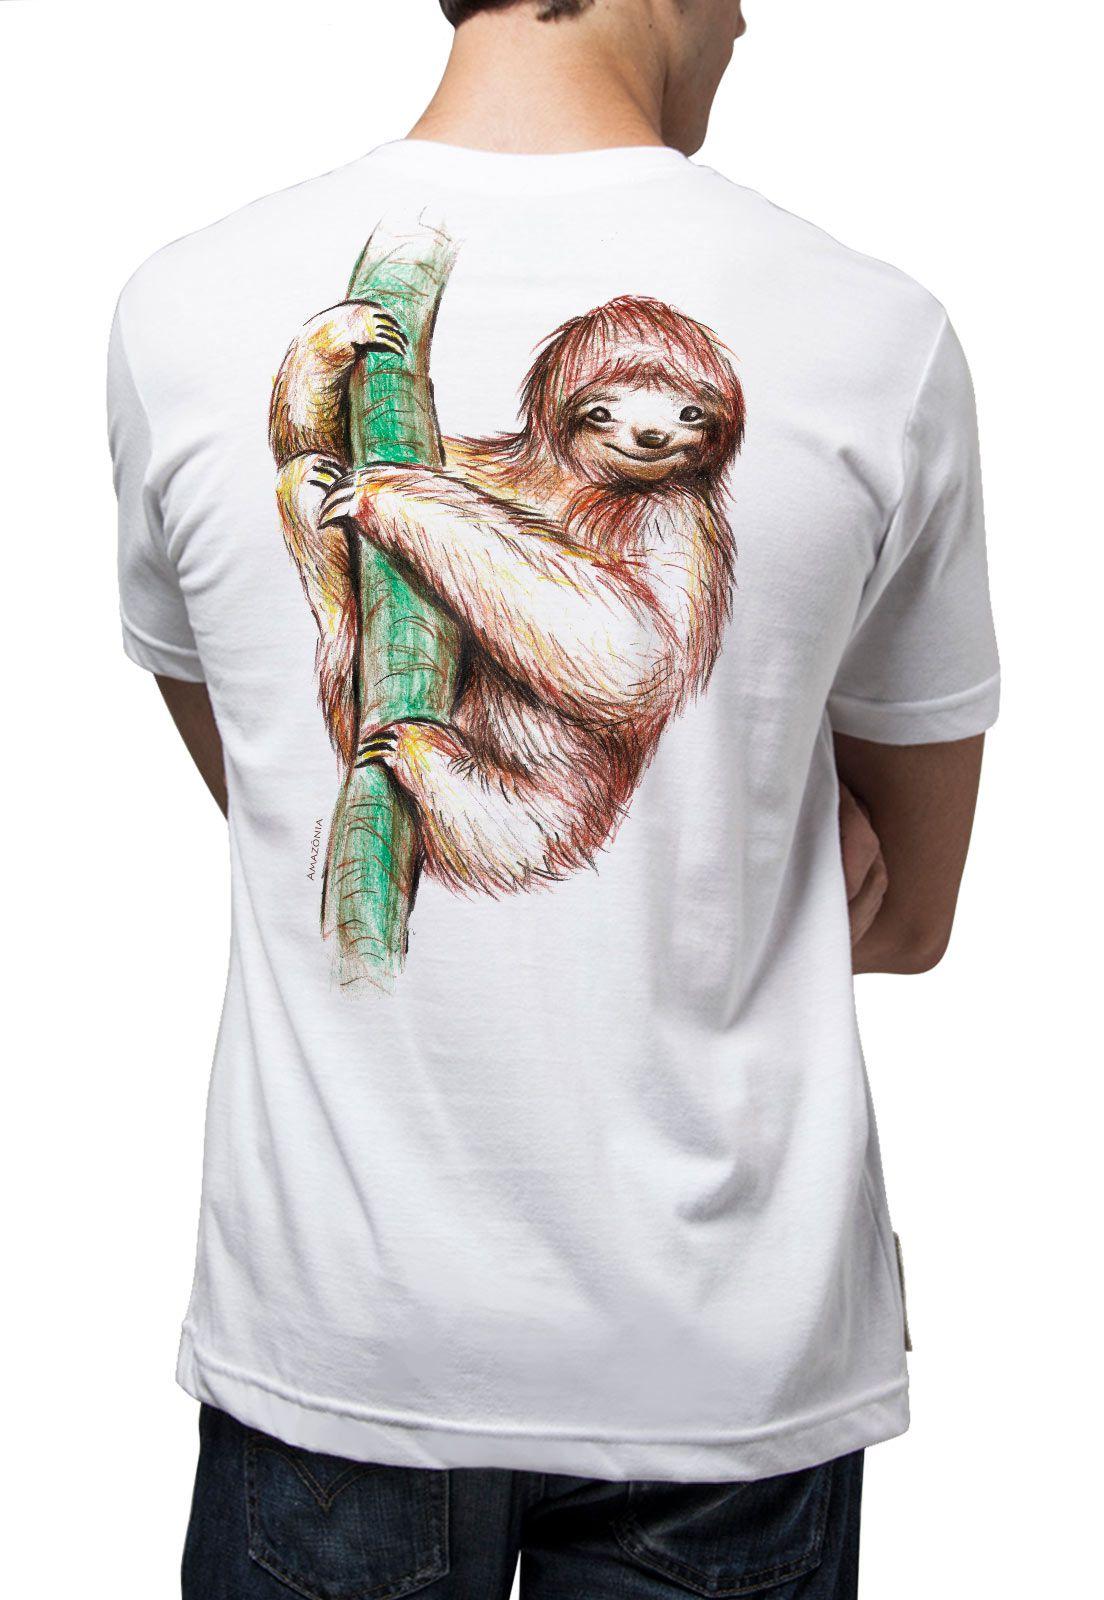 Camiseta Amazônia Bicho Preguiça - Branco